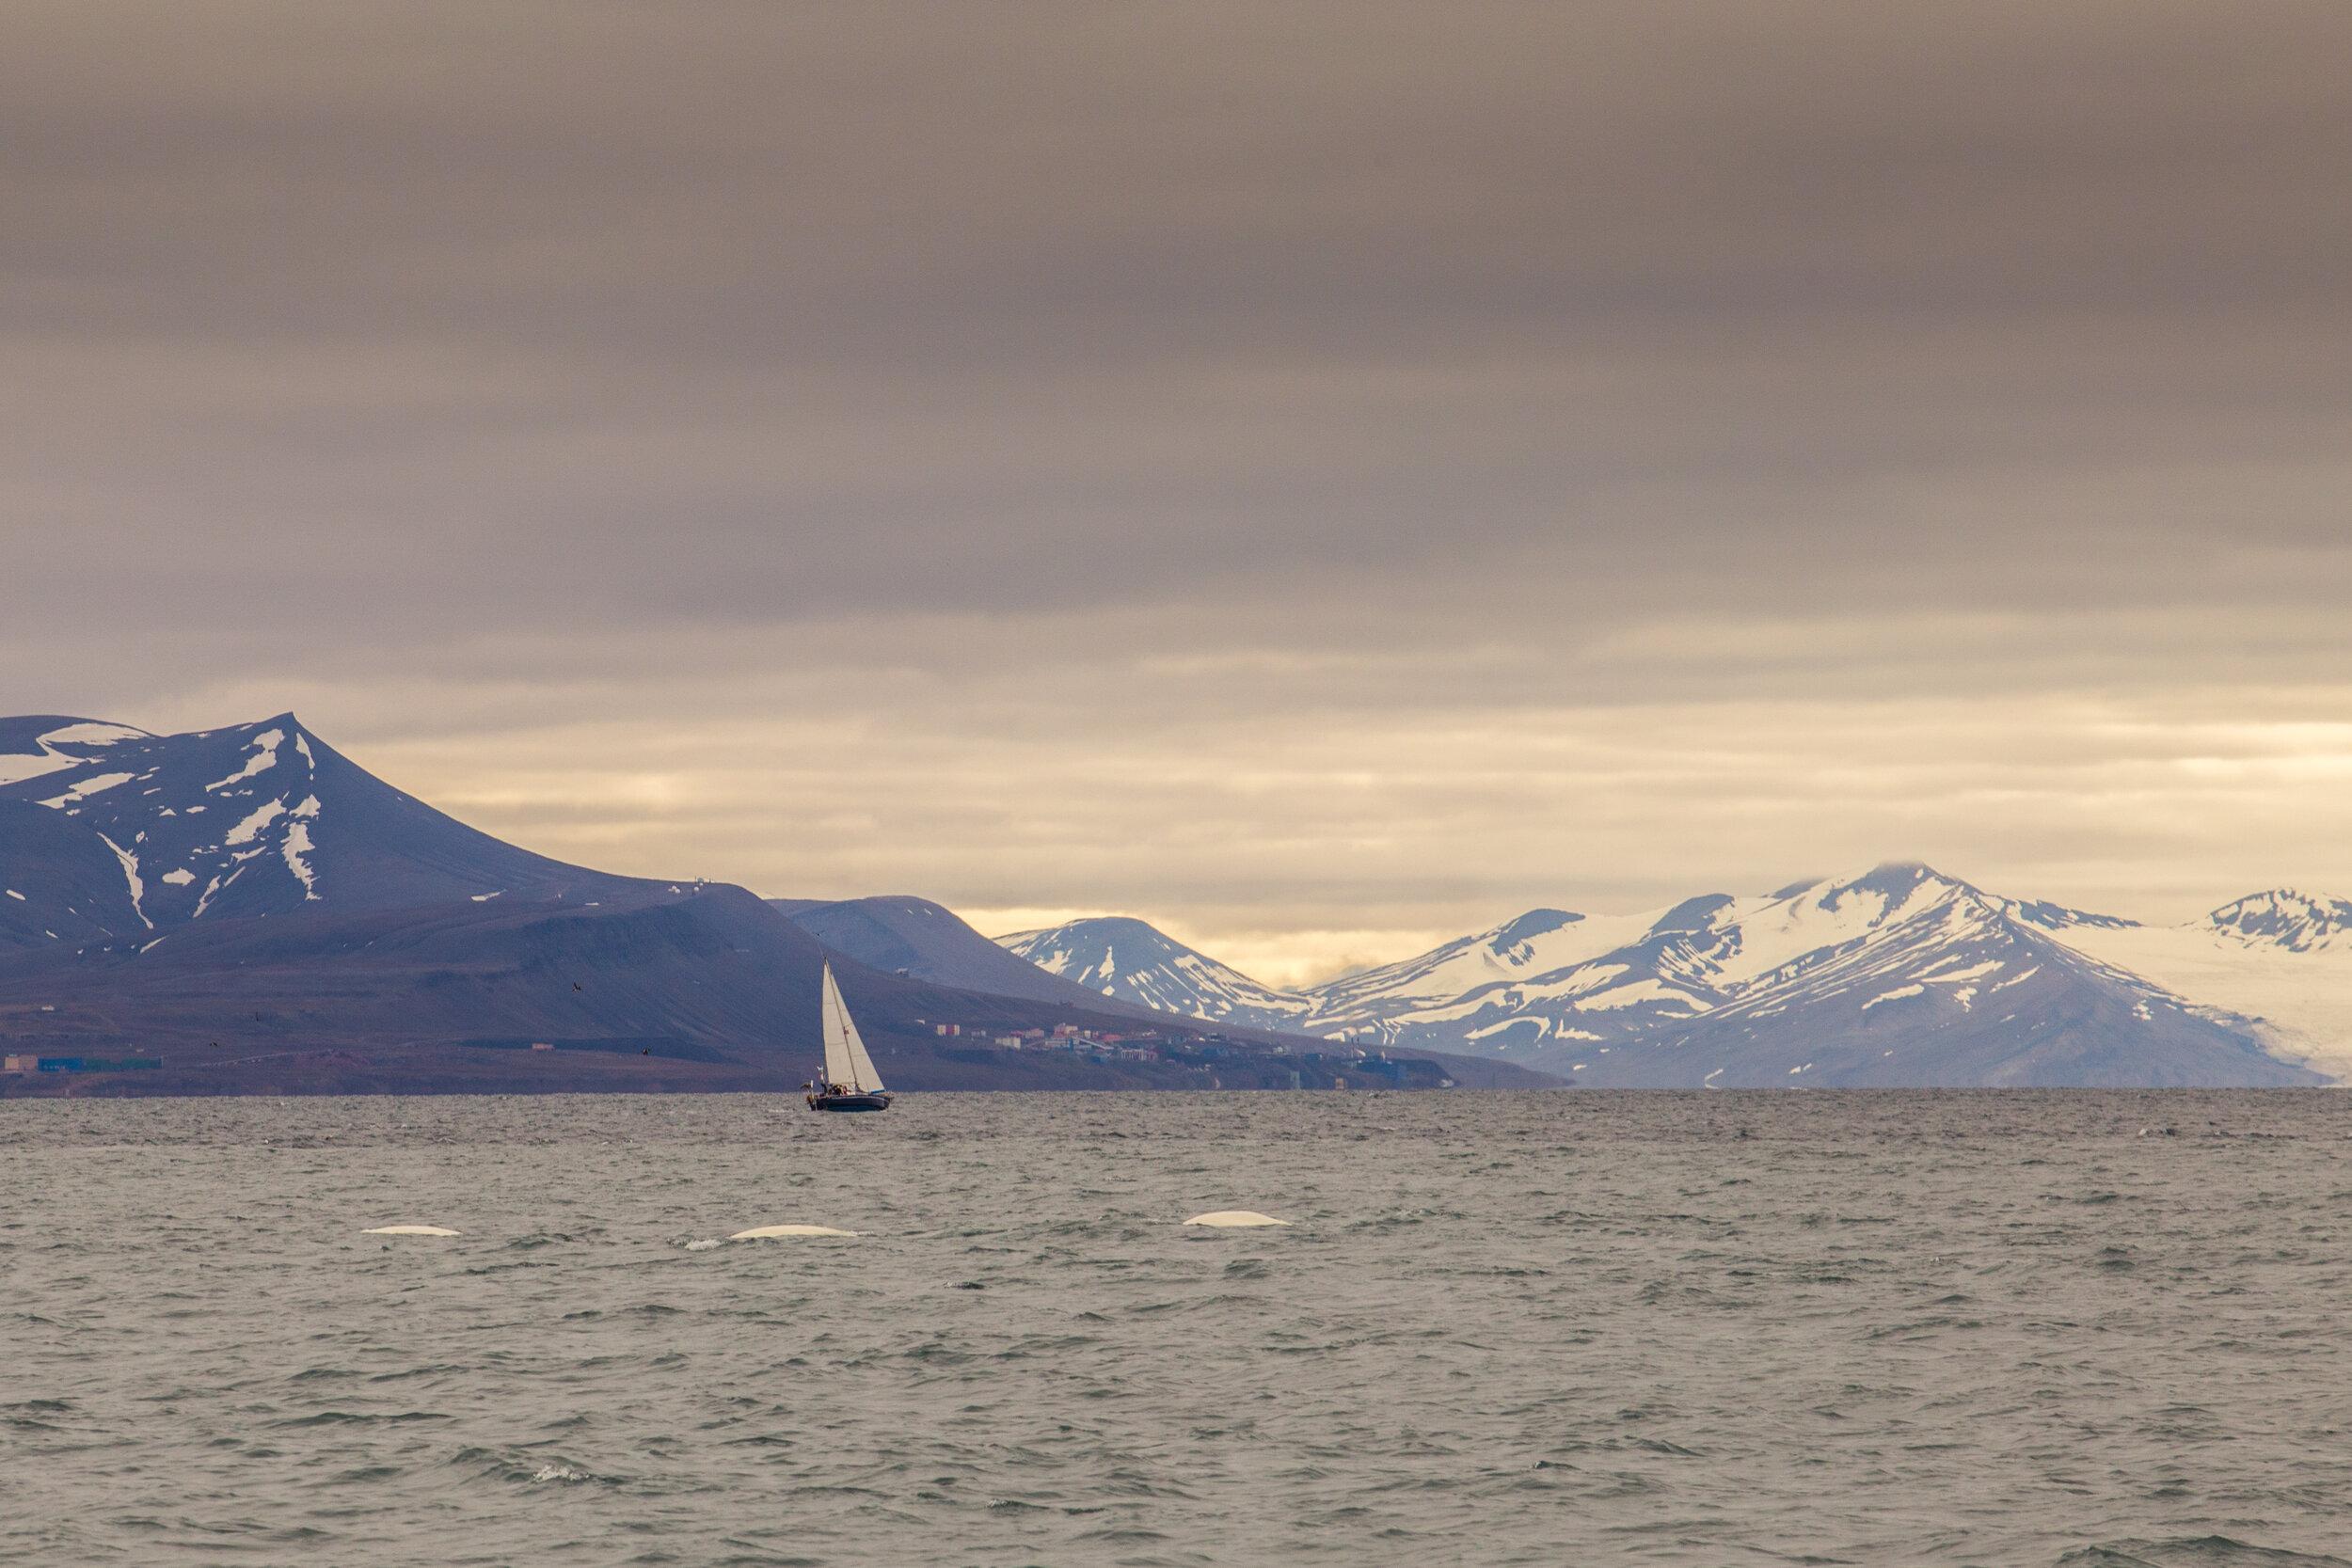 Sailing boat with beluga whales